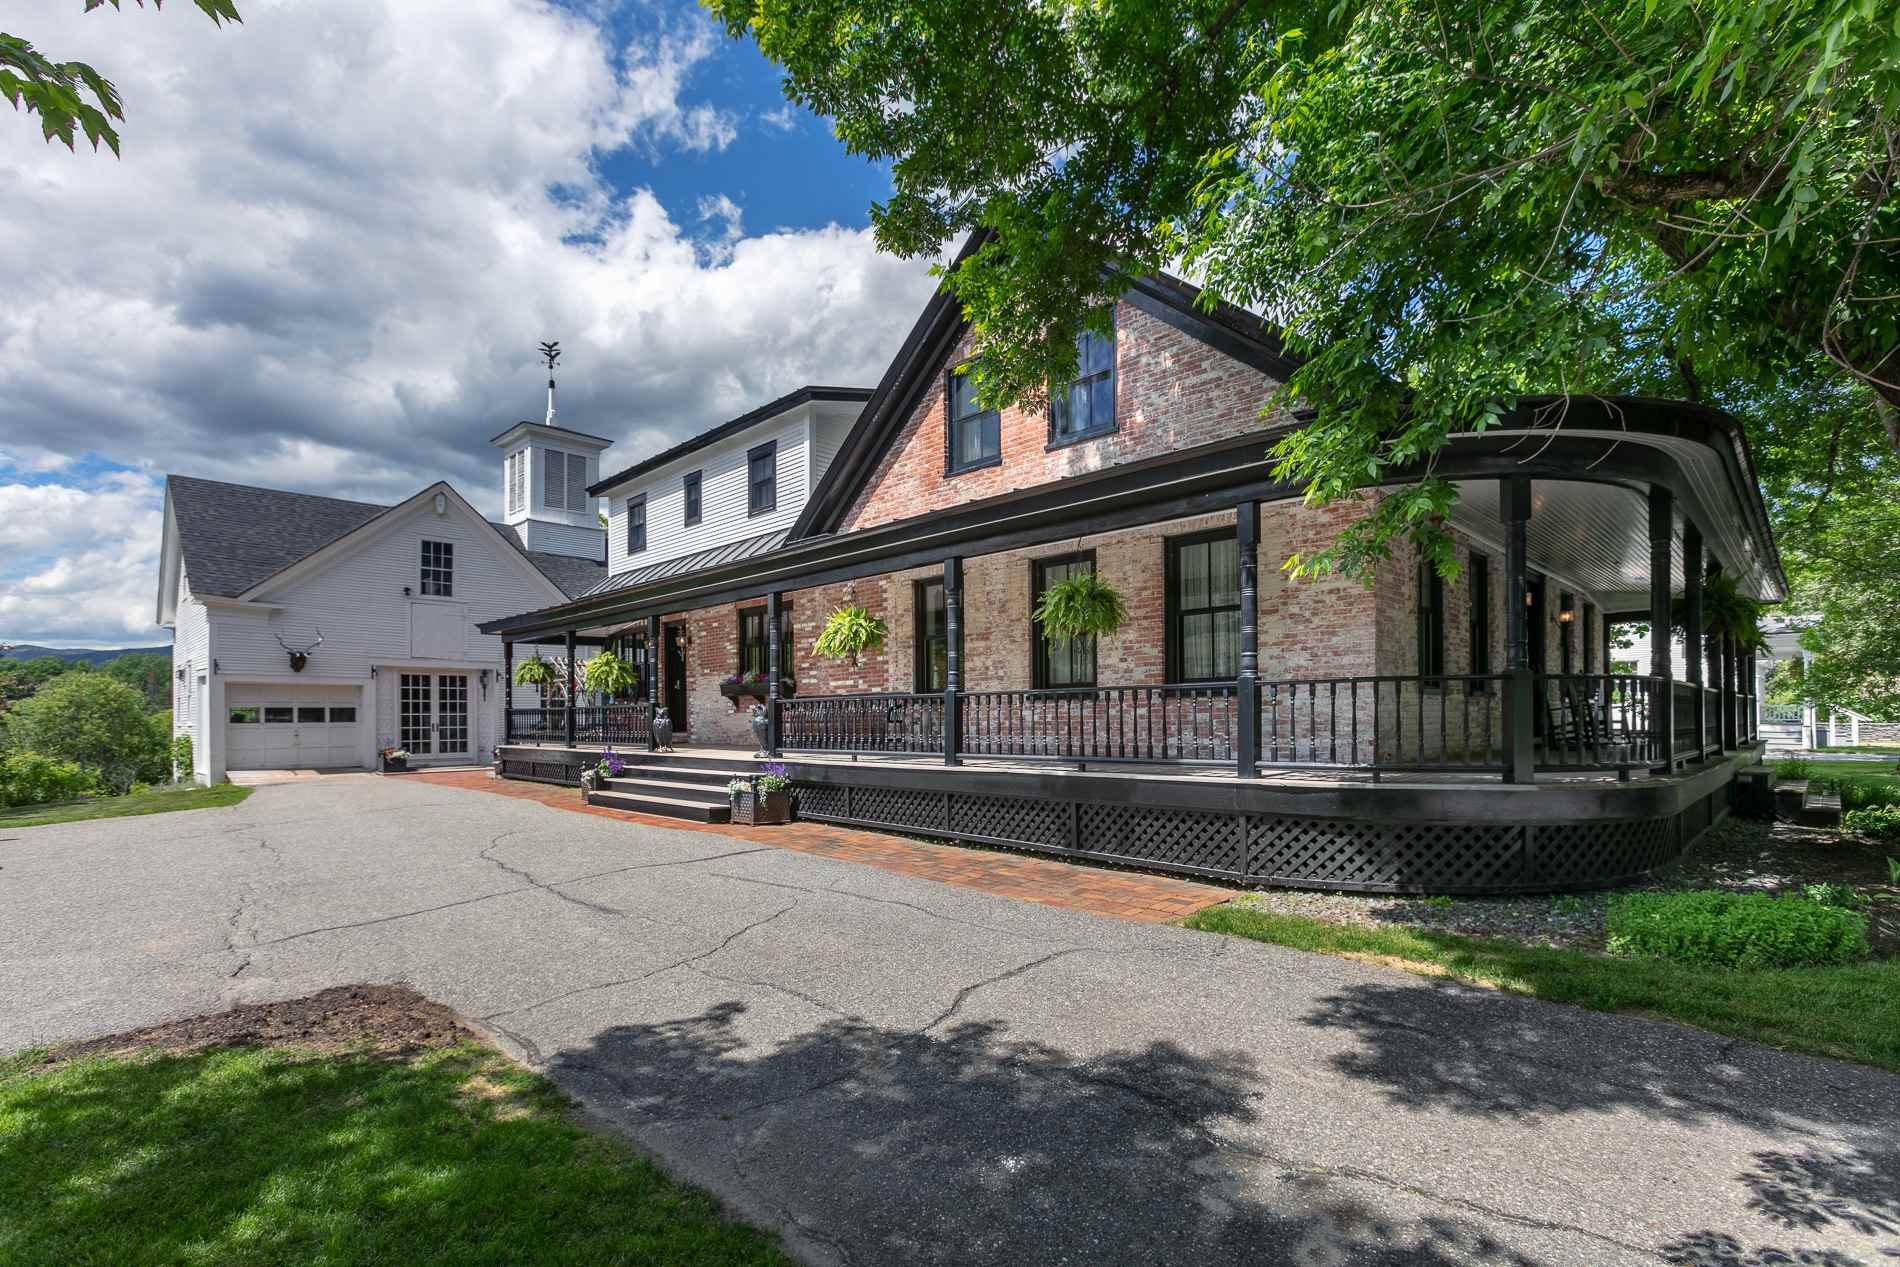 Photo of 237 Maple Street Stowe VT 05672